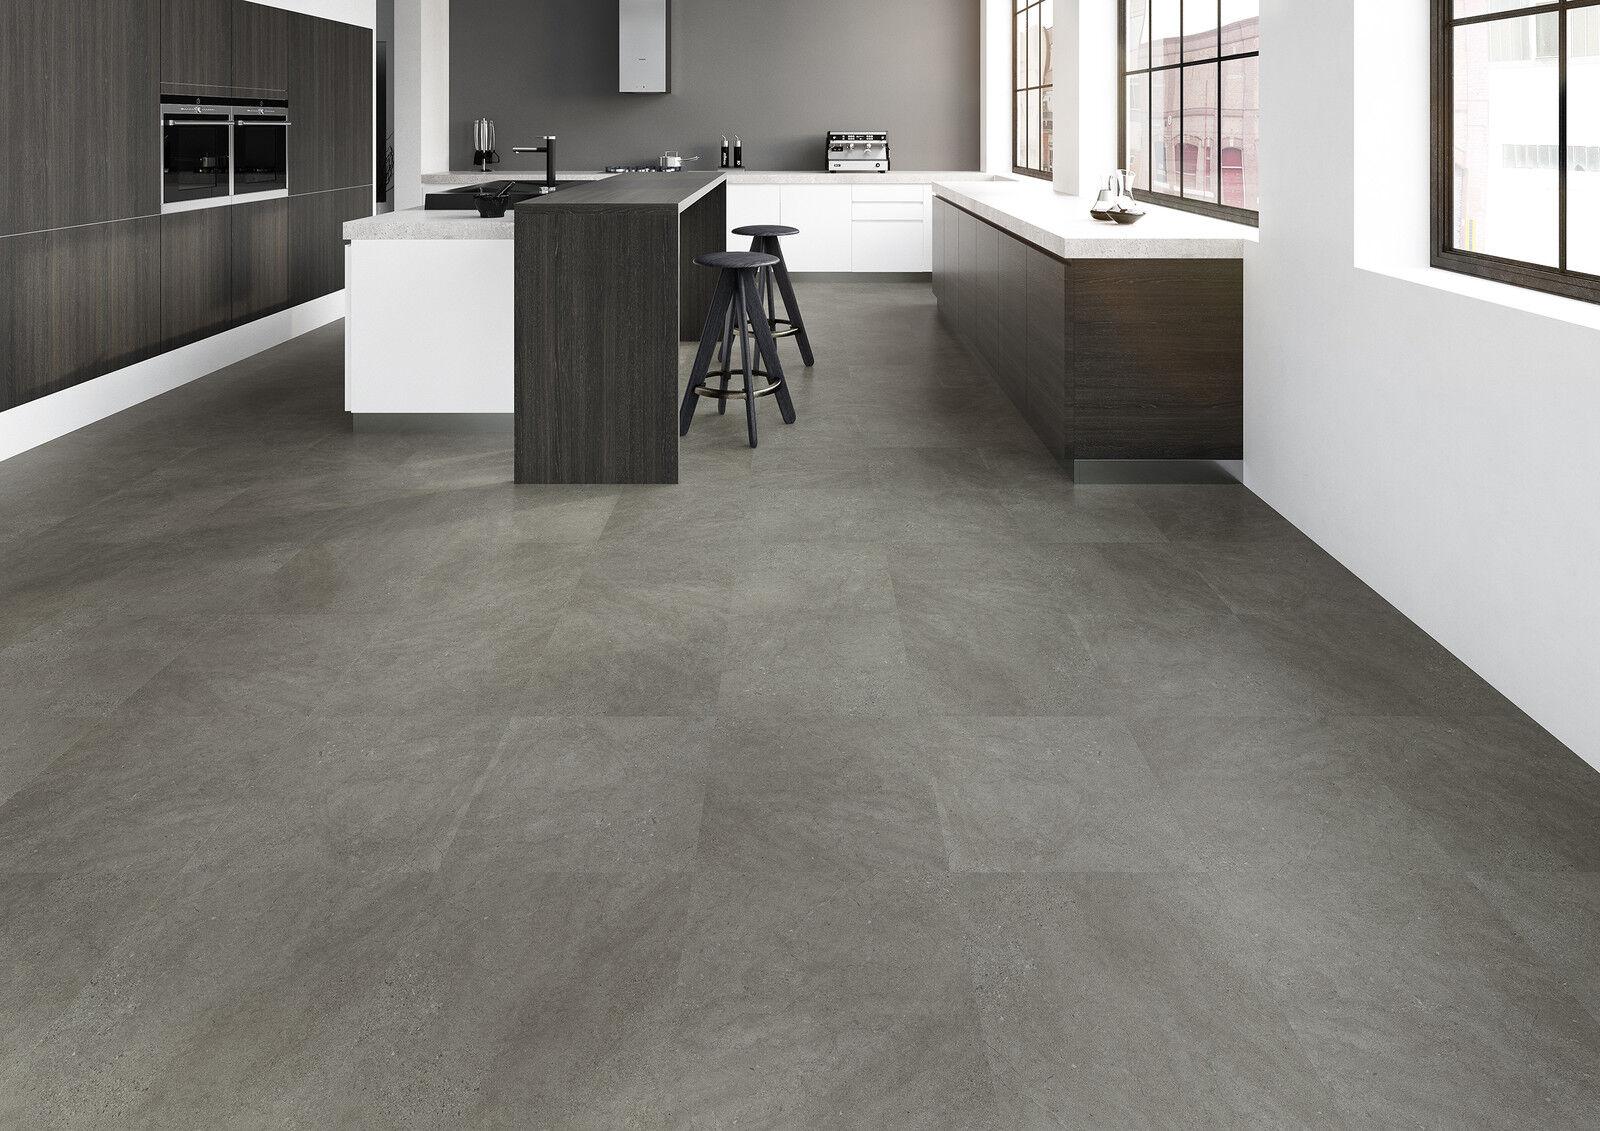 JOKA Rabatt 10% 10% 10% 845 Designböden 330 4,5mm Dark Concrete PVC 1m²/35,96 c15cbf